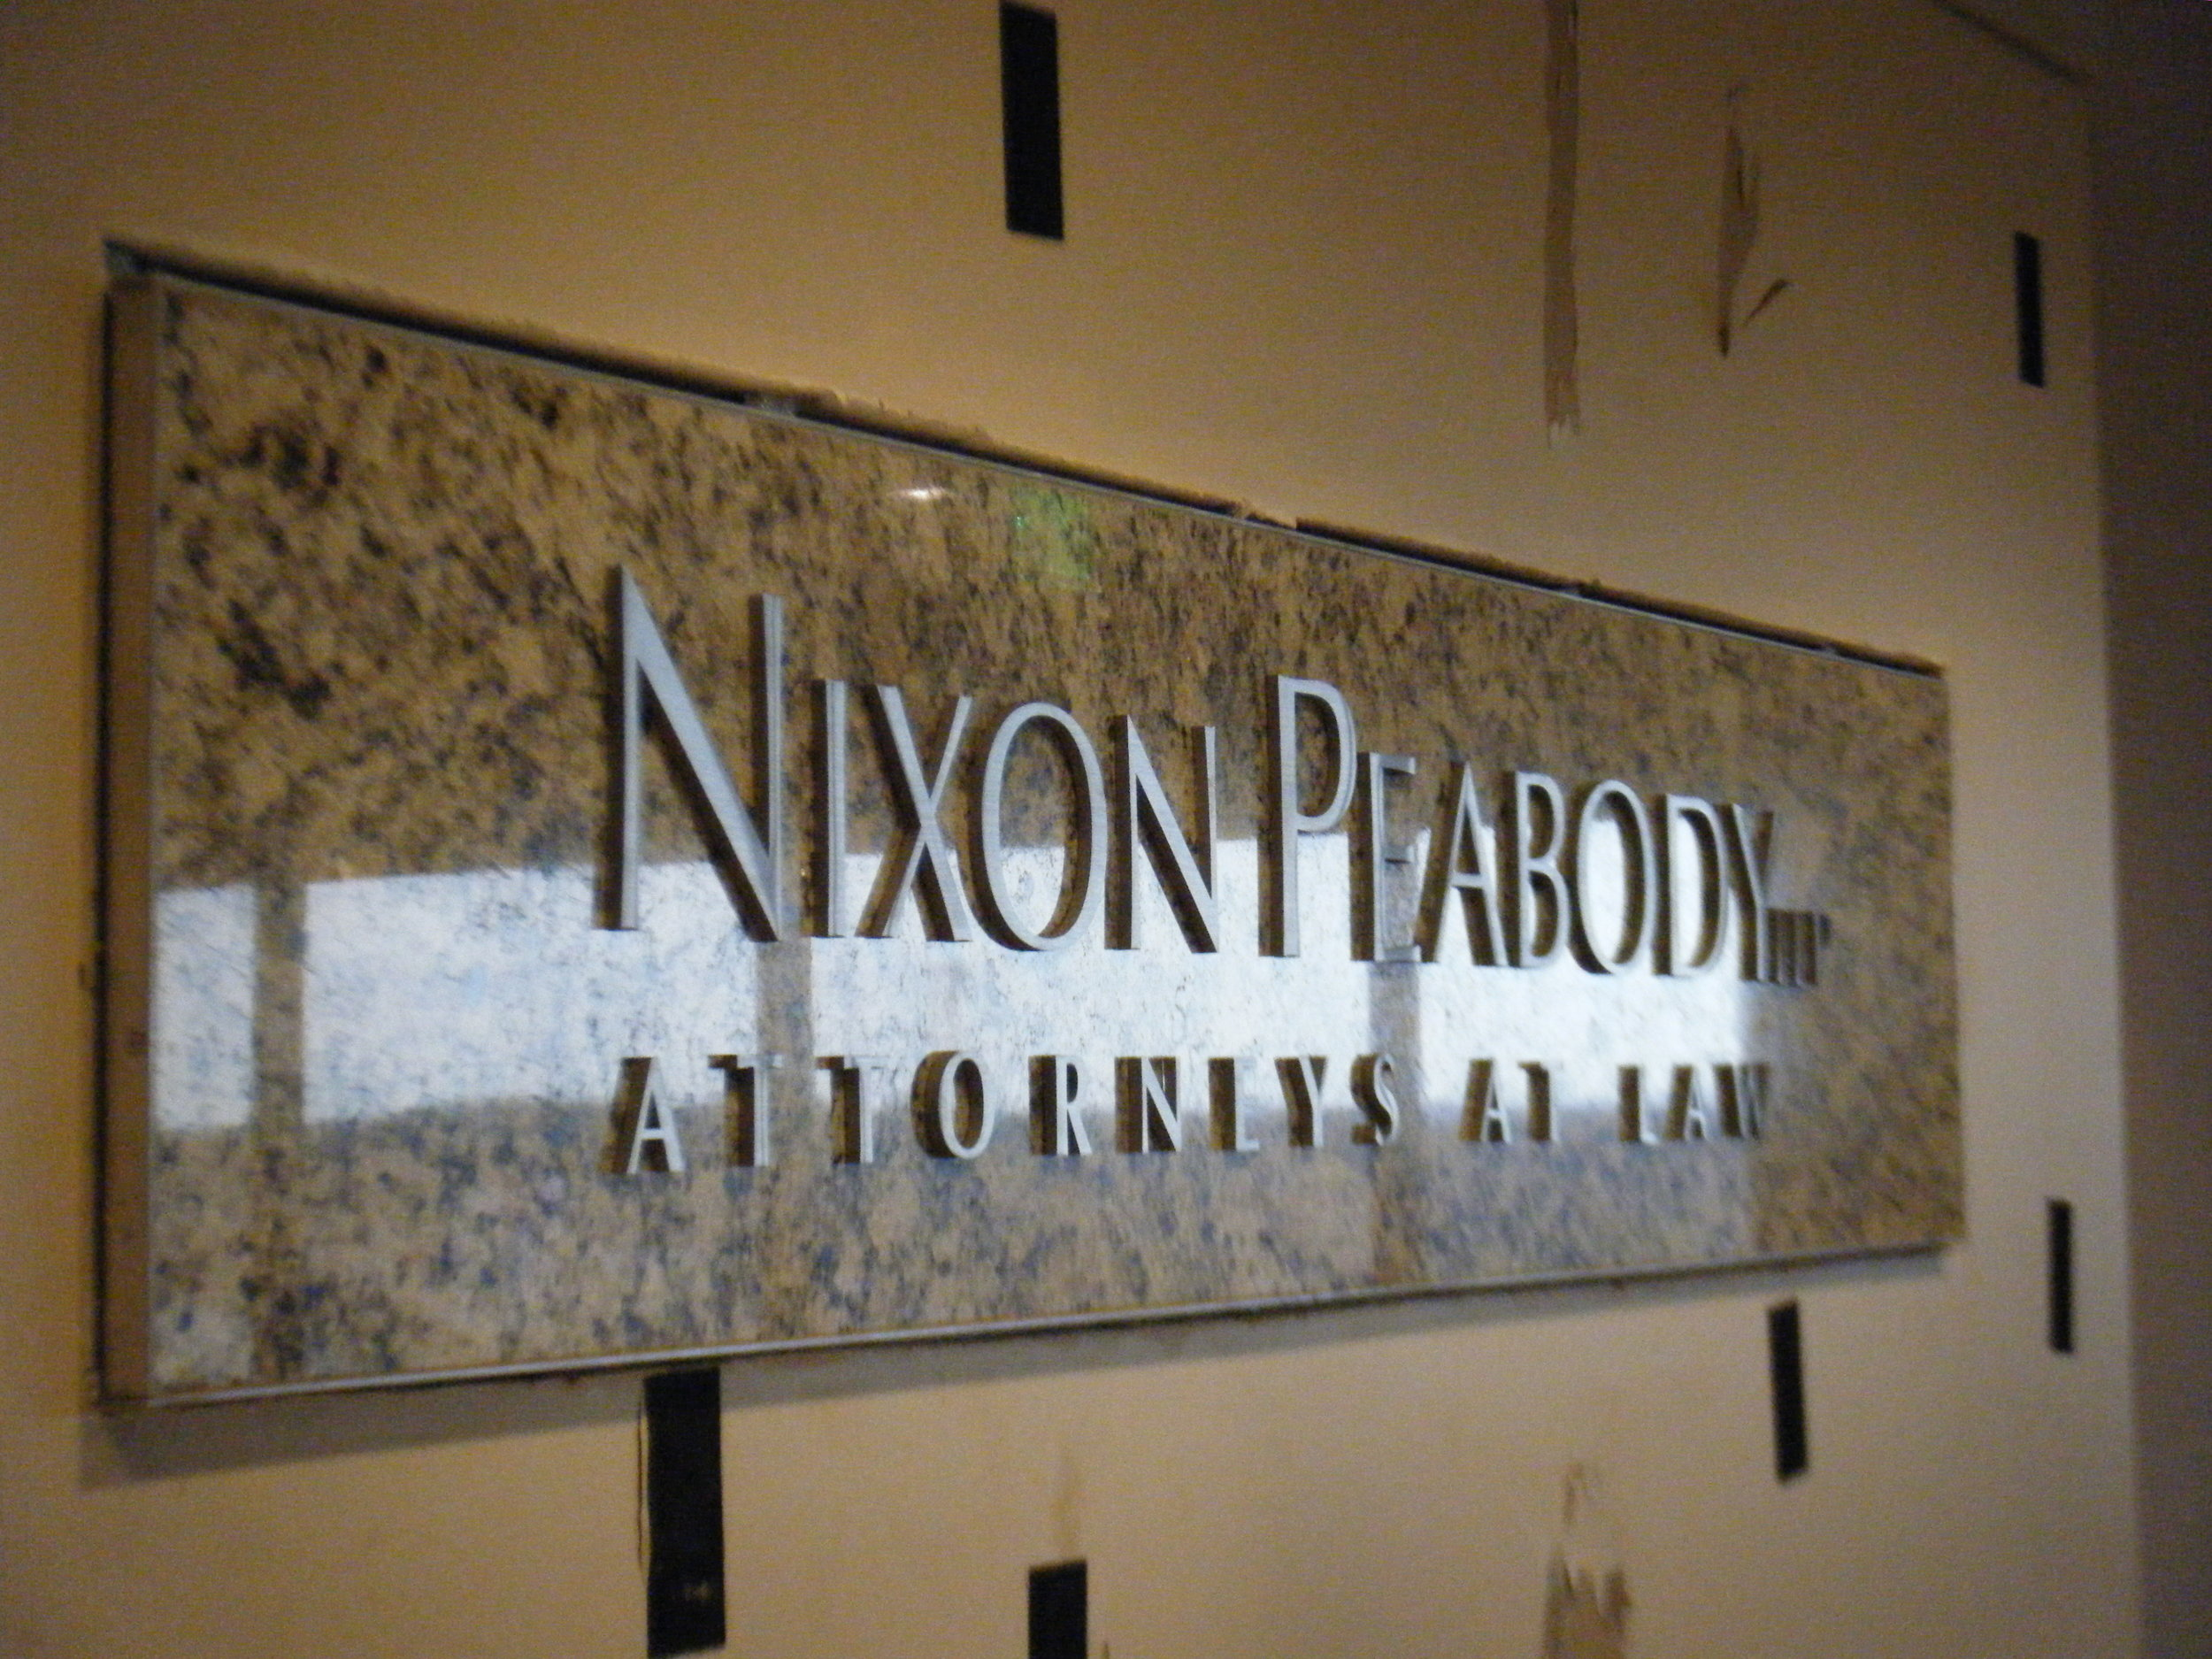 Nixon Peobody Interior Wall sign .JPG